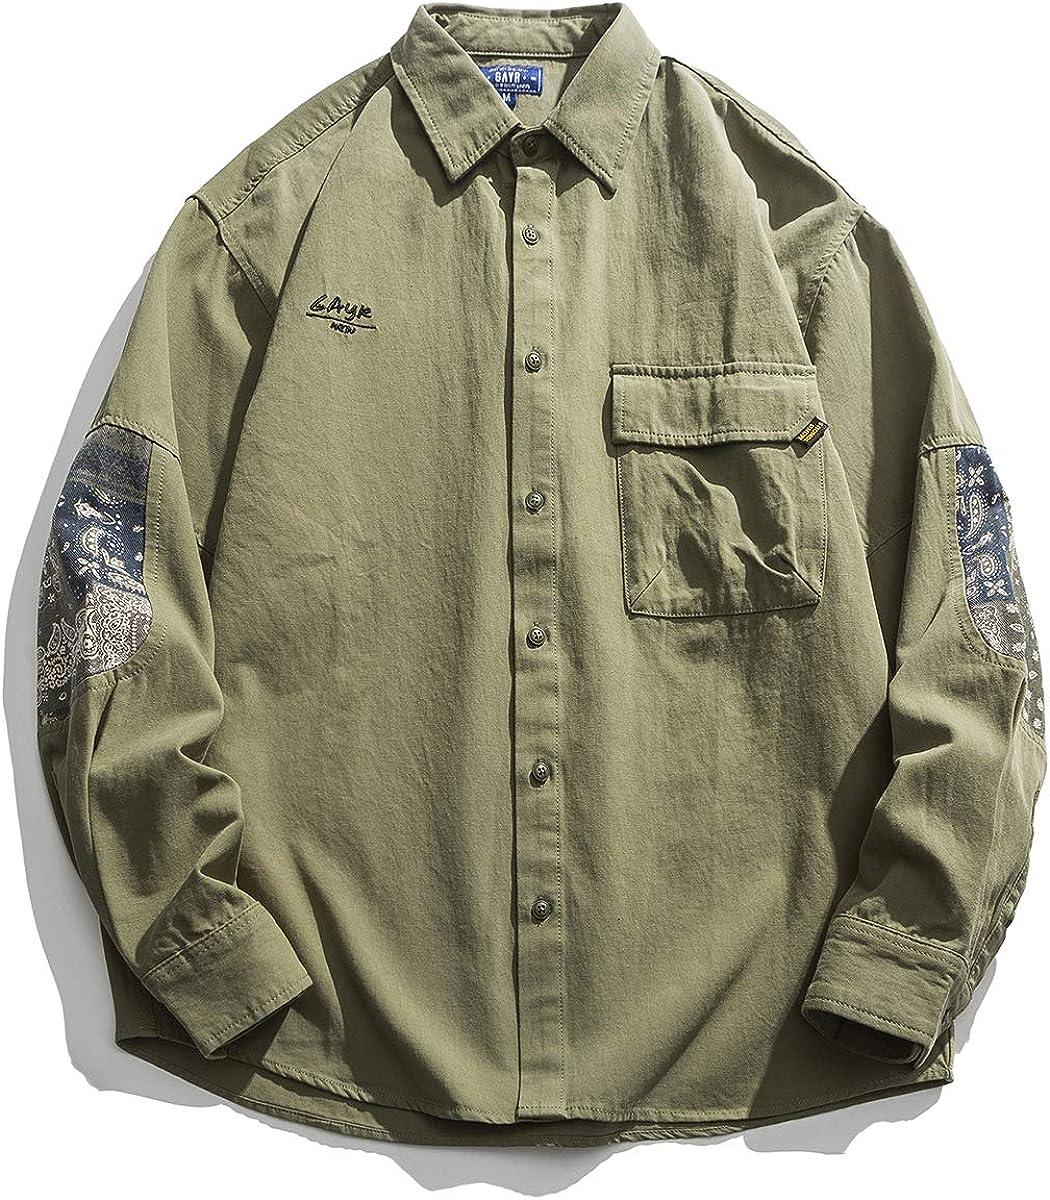 Seidarise Men's Casual Shirts, Button Down Shirts Long Sleeve Loose Fit Lightweight Tops